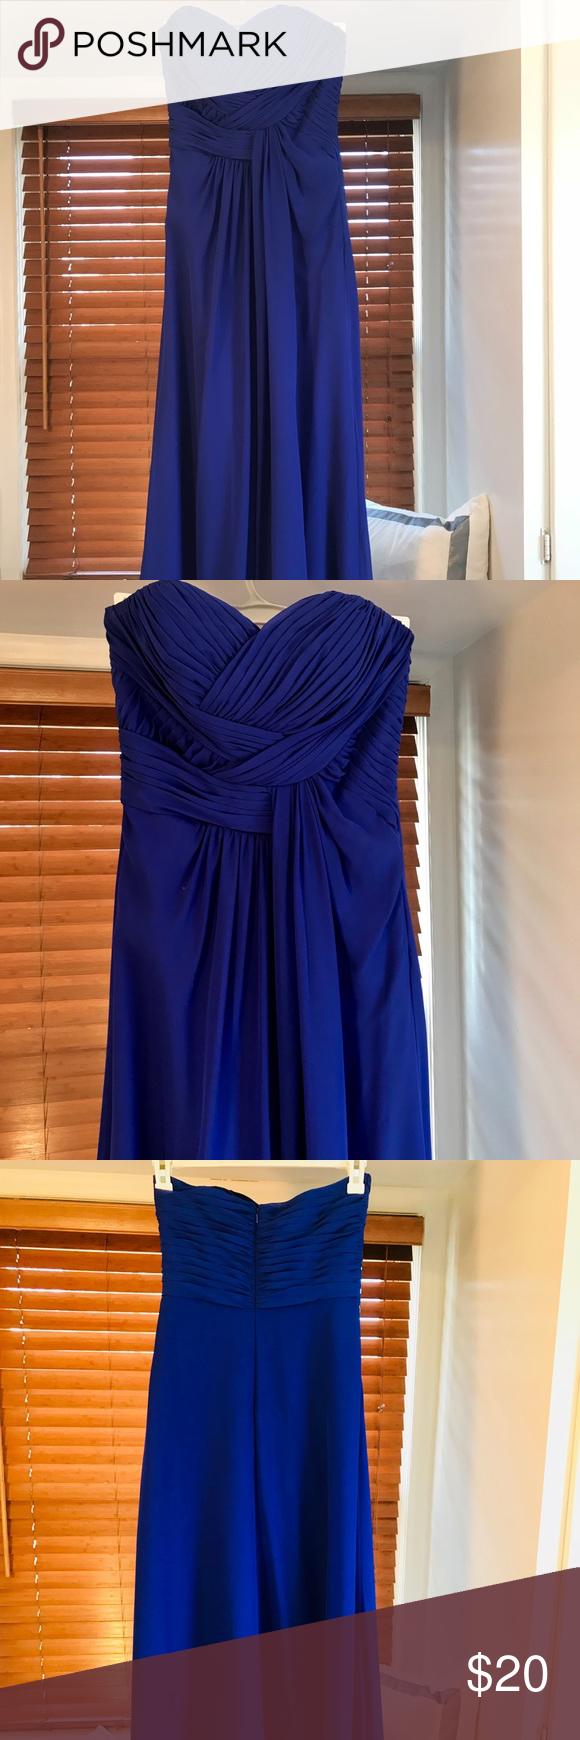 Cobalt blue jasmine bridesmaid dress style b royal blue